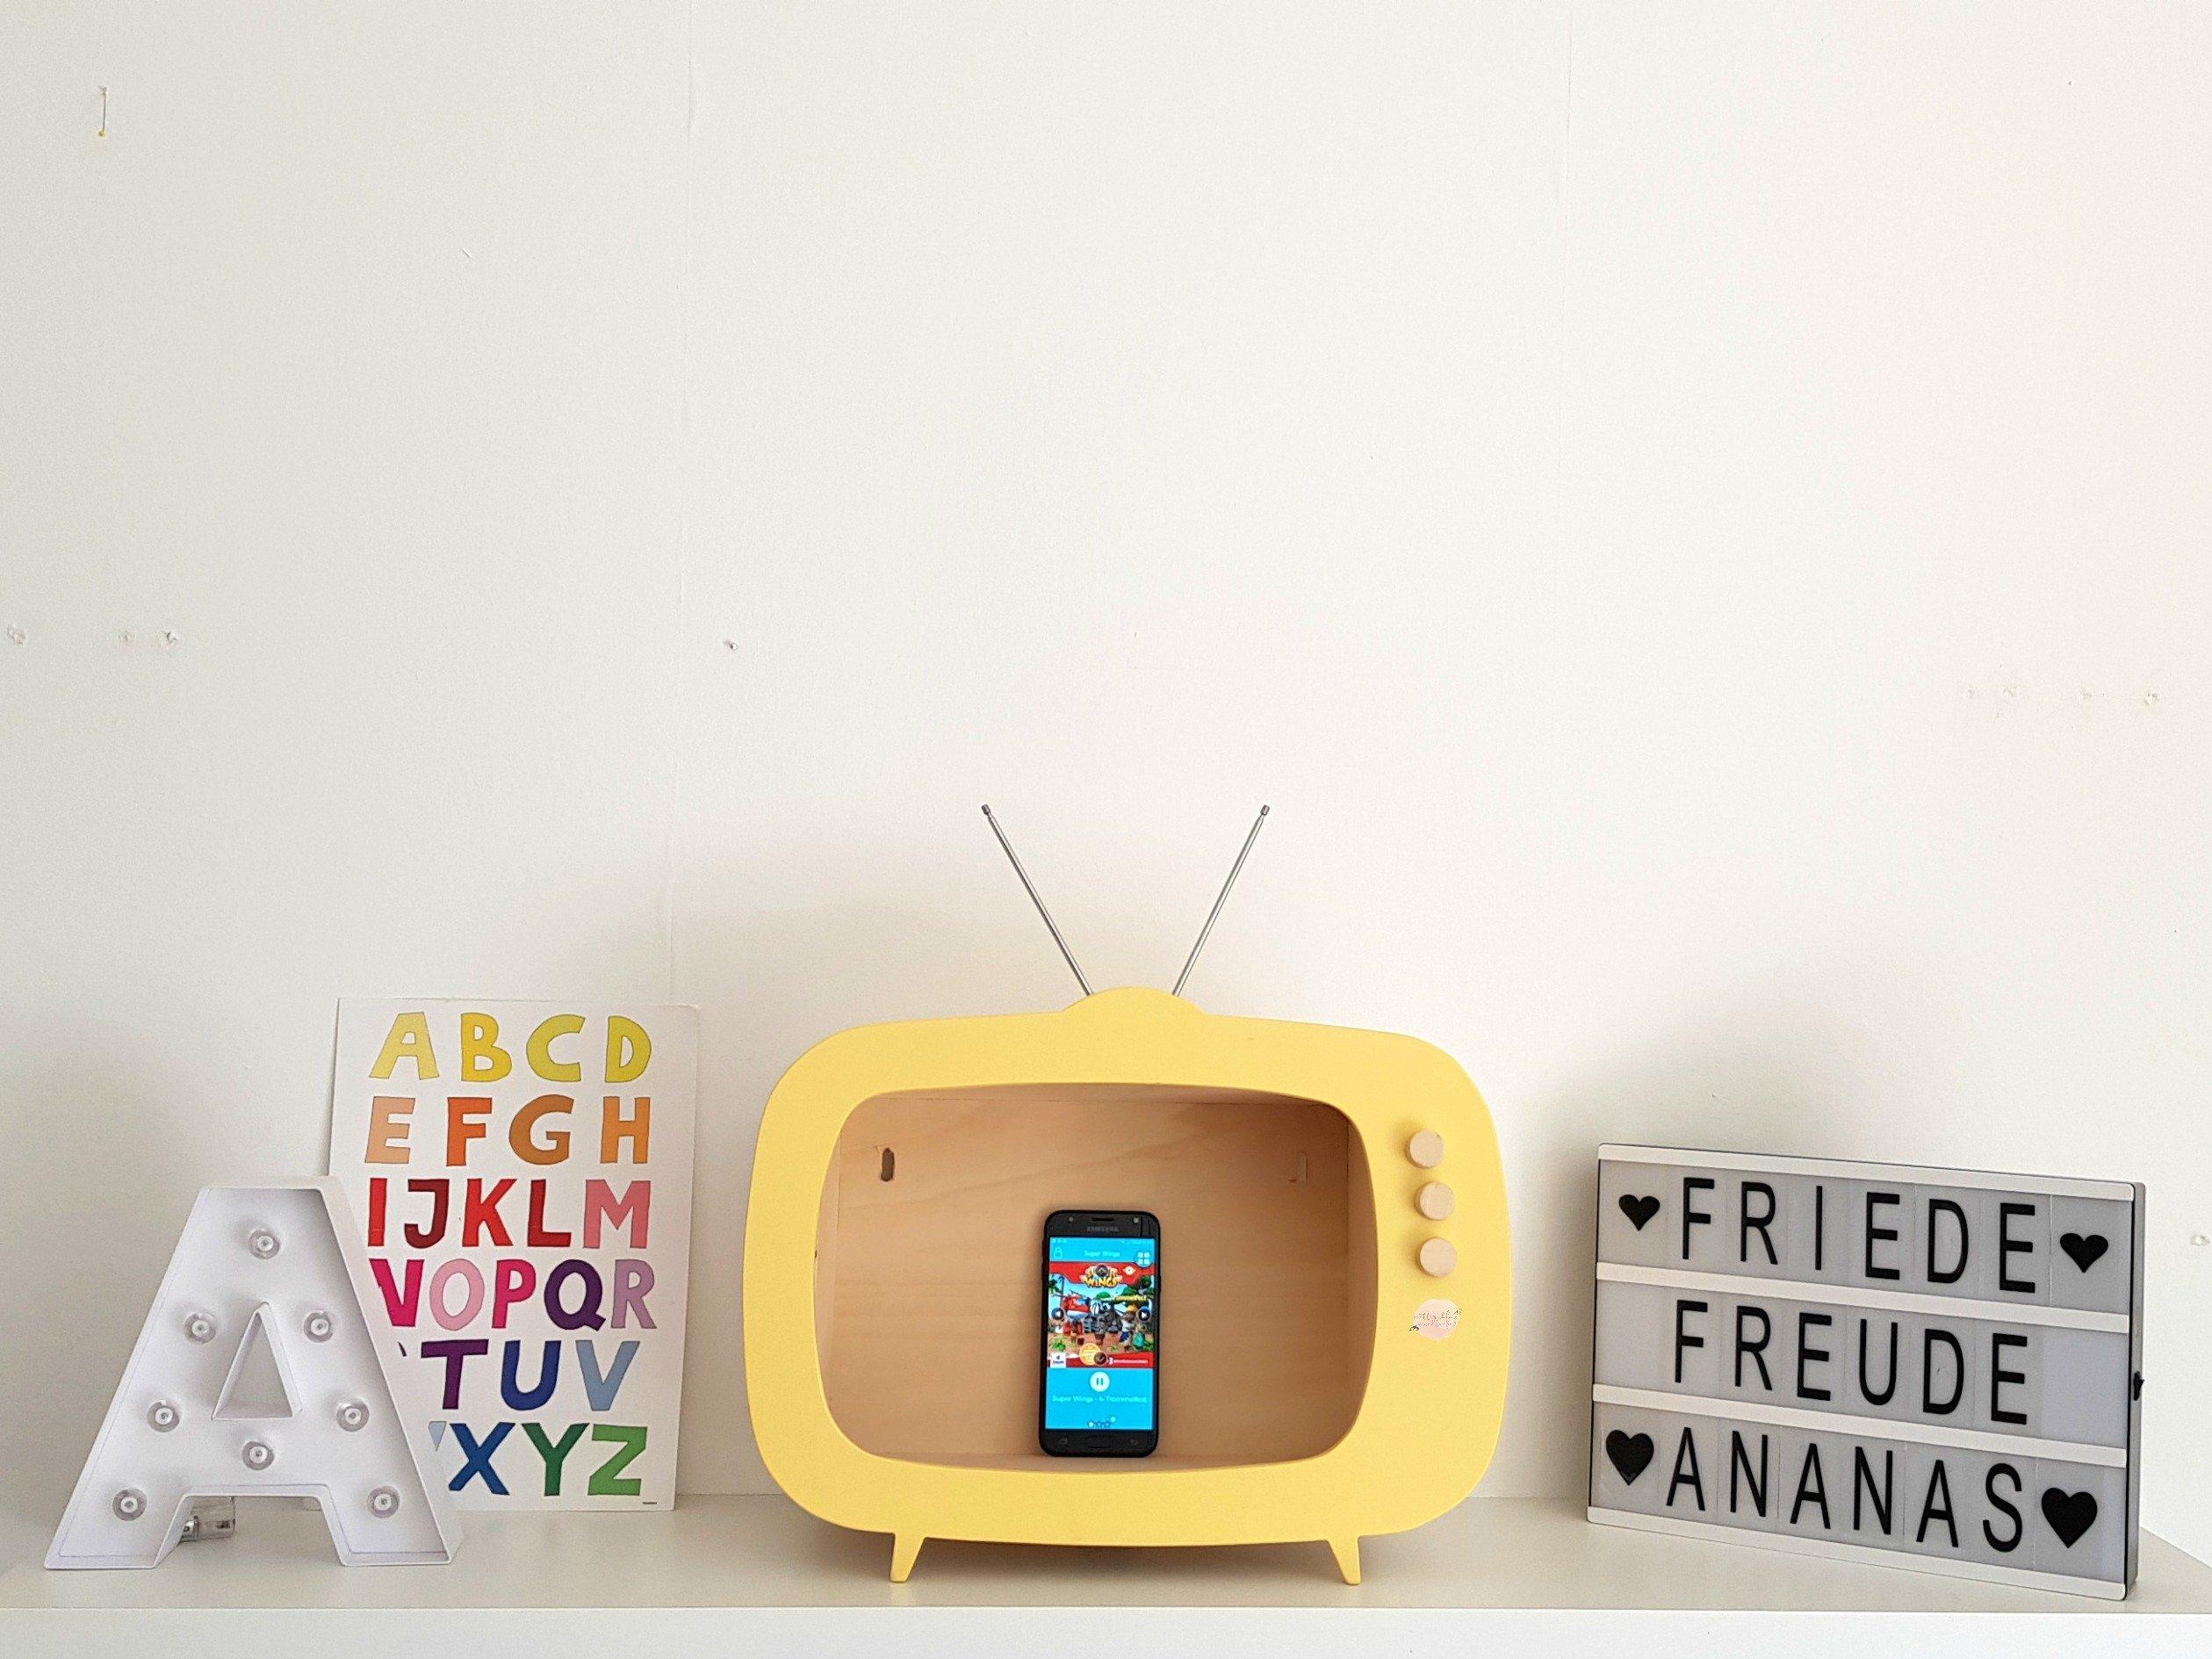 selbstbestimmter medienkonsum ooigo kidsplayer. Black Bedroom Furniture Sets. Home Design Ideas